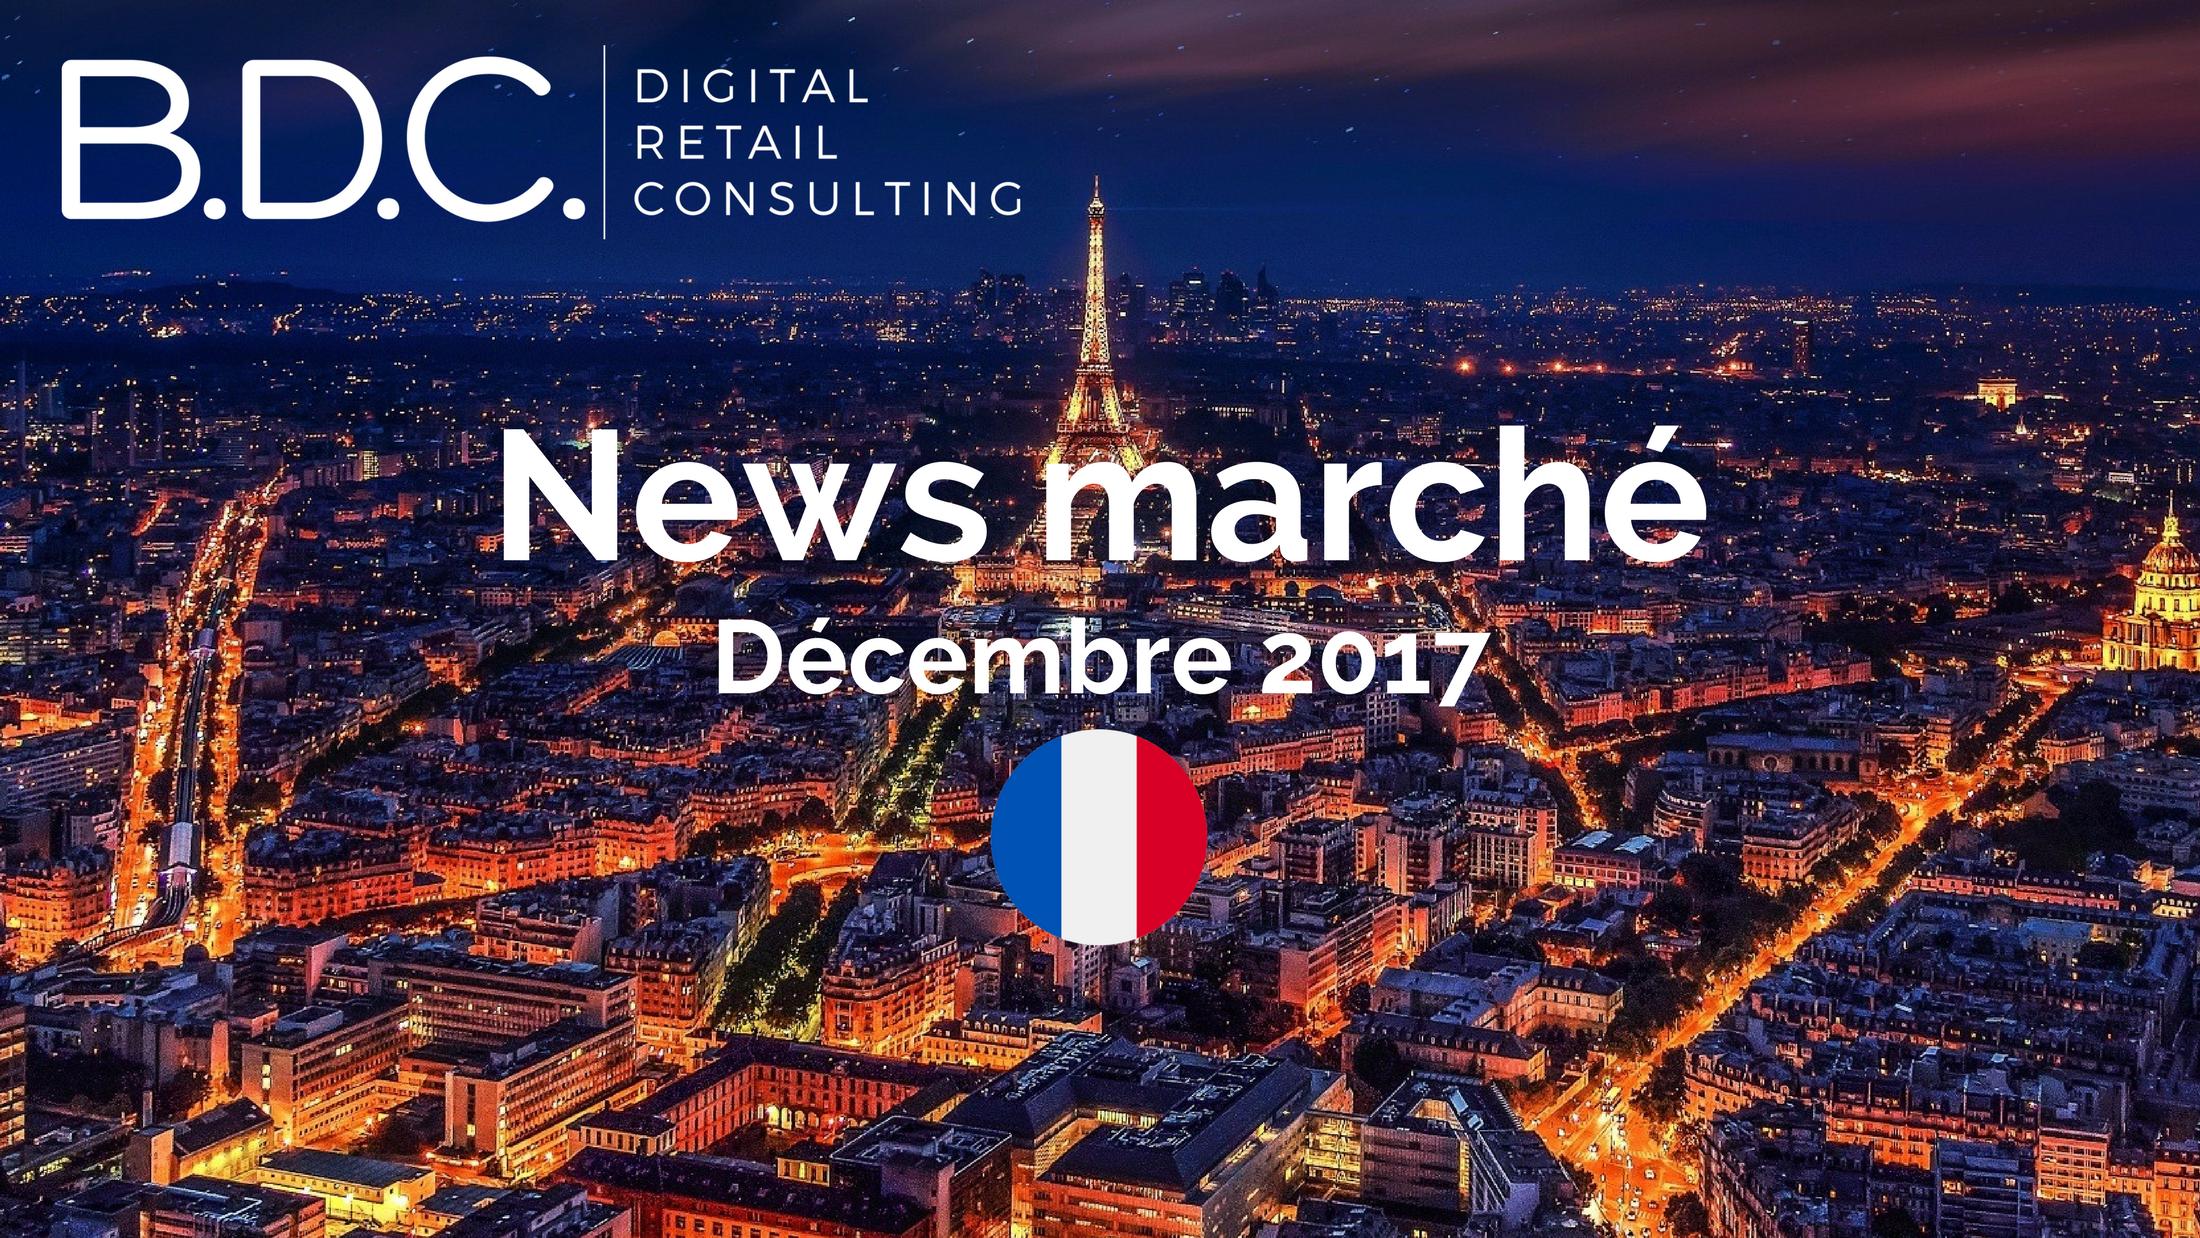 News Marché décembre 2017 - NEWS MARCHÉ - DÉCEMBRE 2017